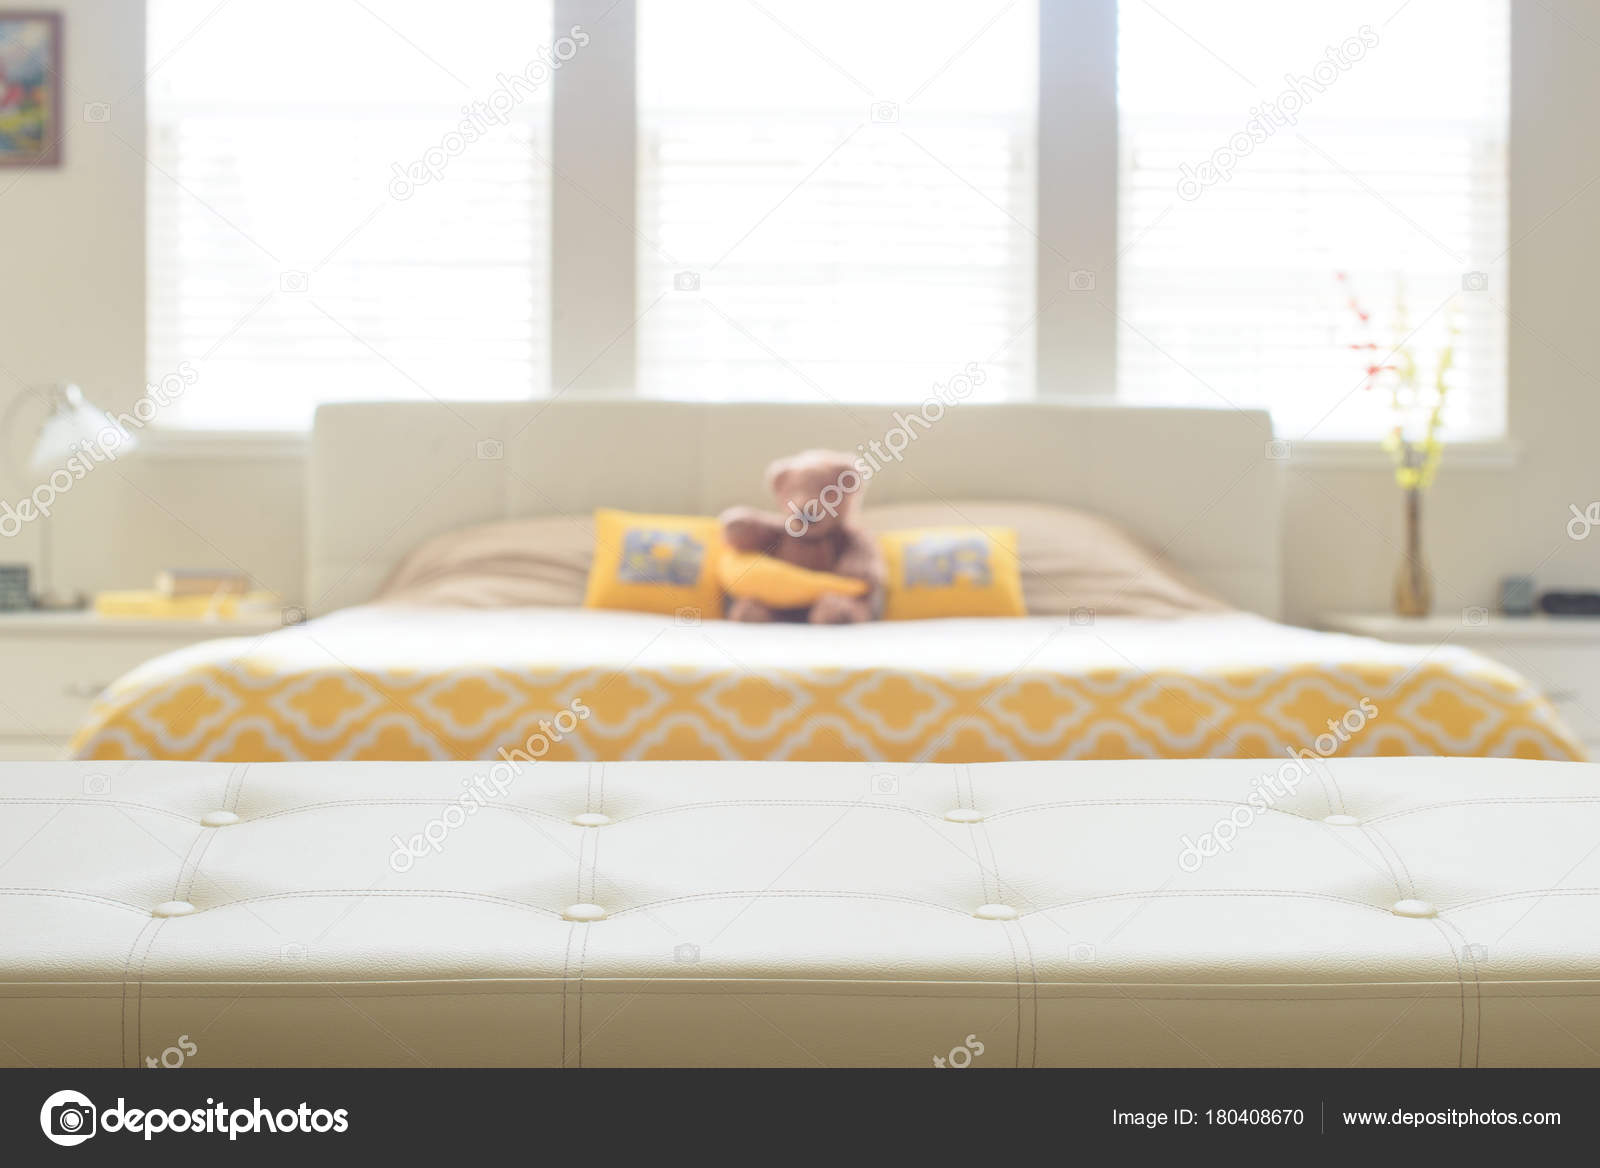 https://st3.depositphotos.com/4575657/18040/i/1600/depositphotos_180408670-stockafbeelding-beige-lederen-leeg-bankje-in.jpg